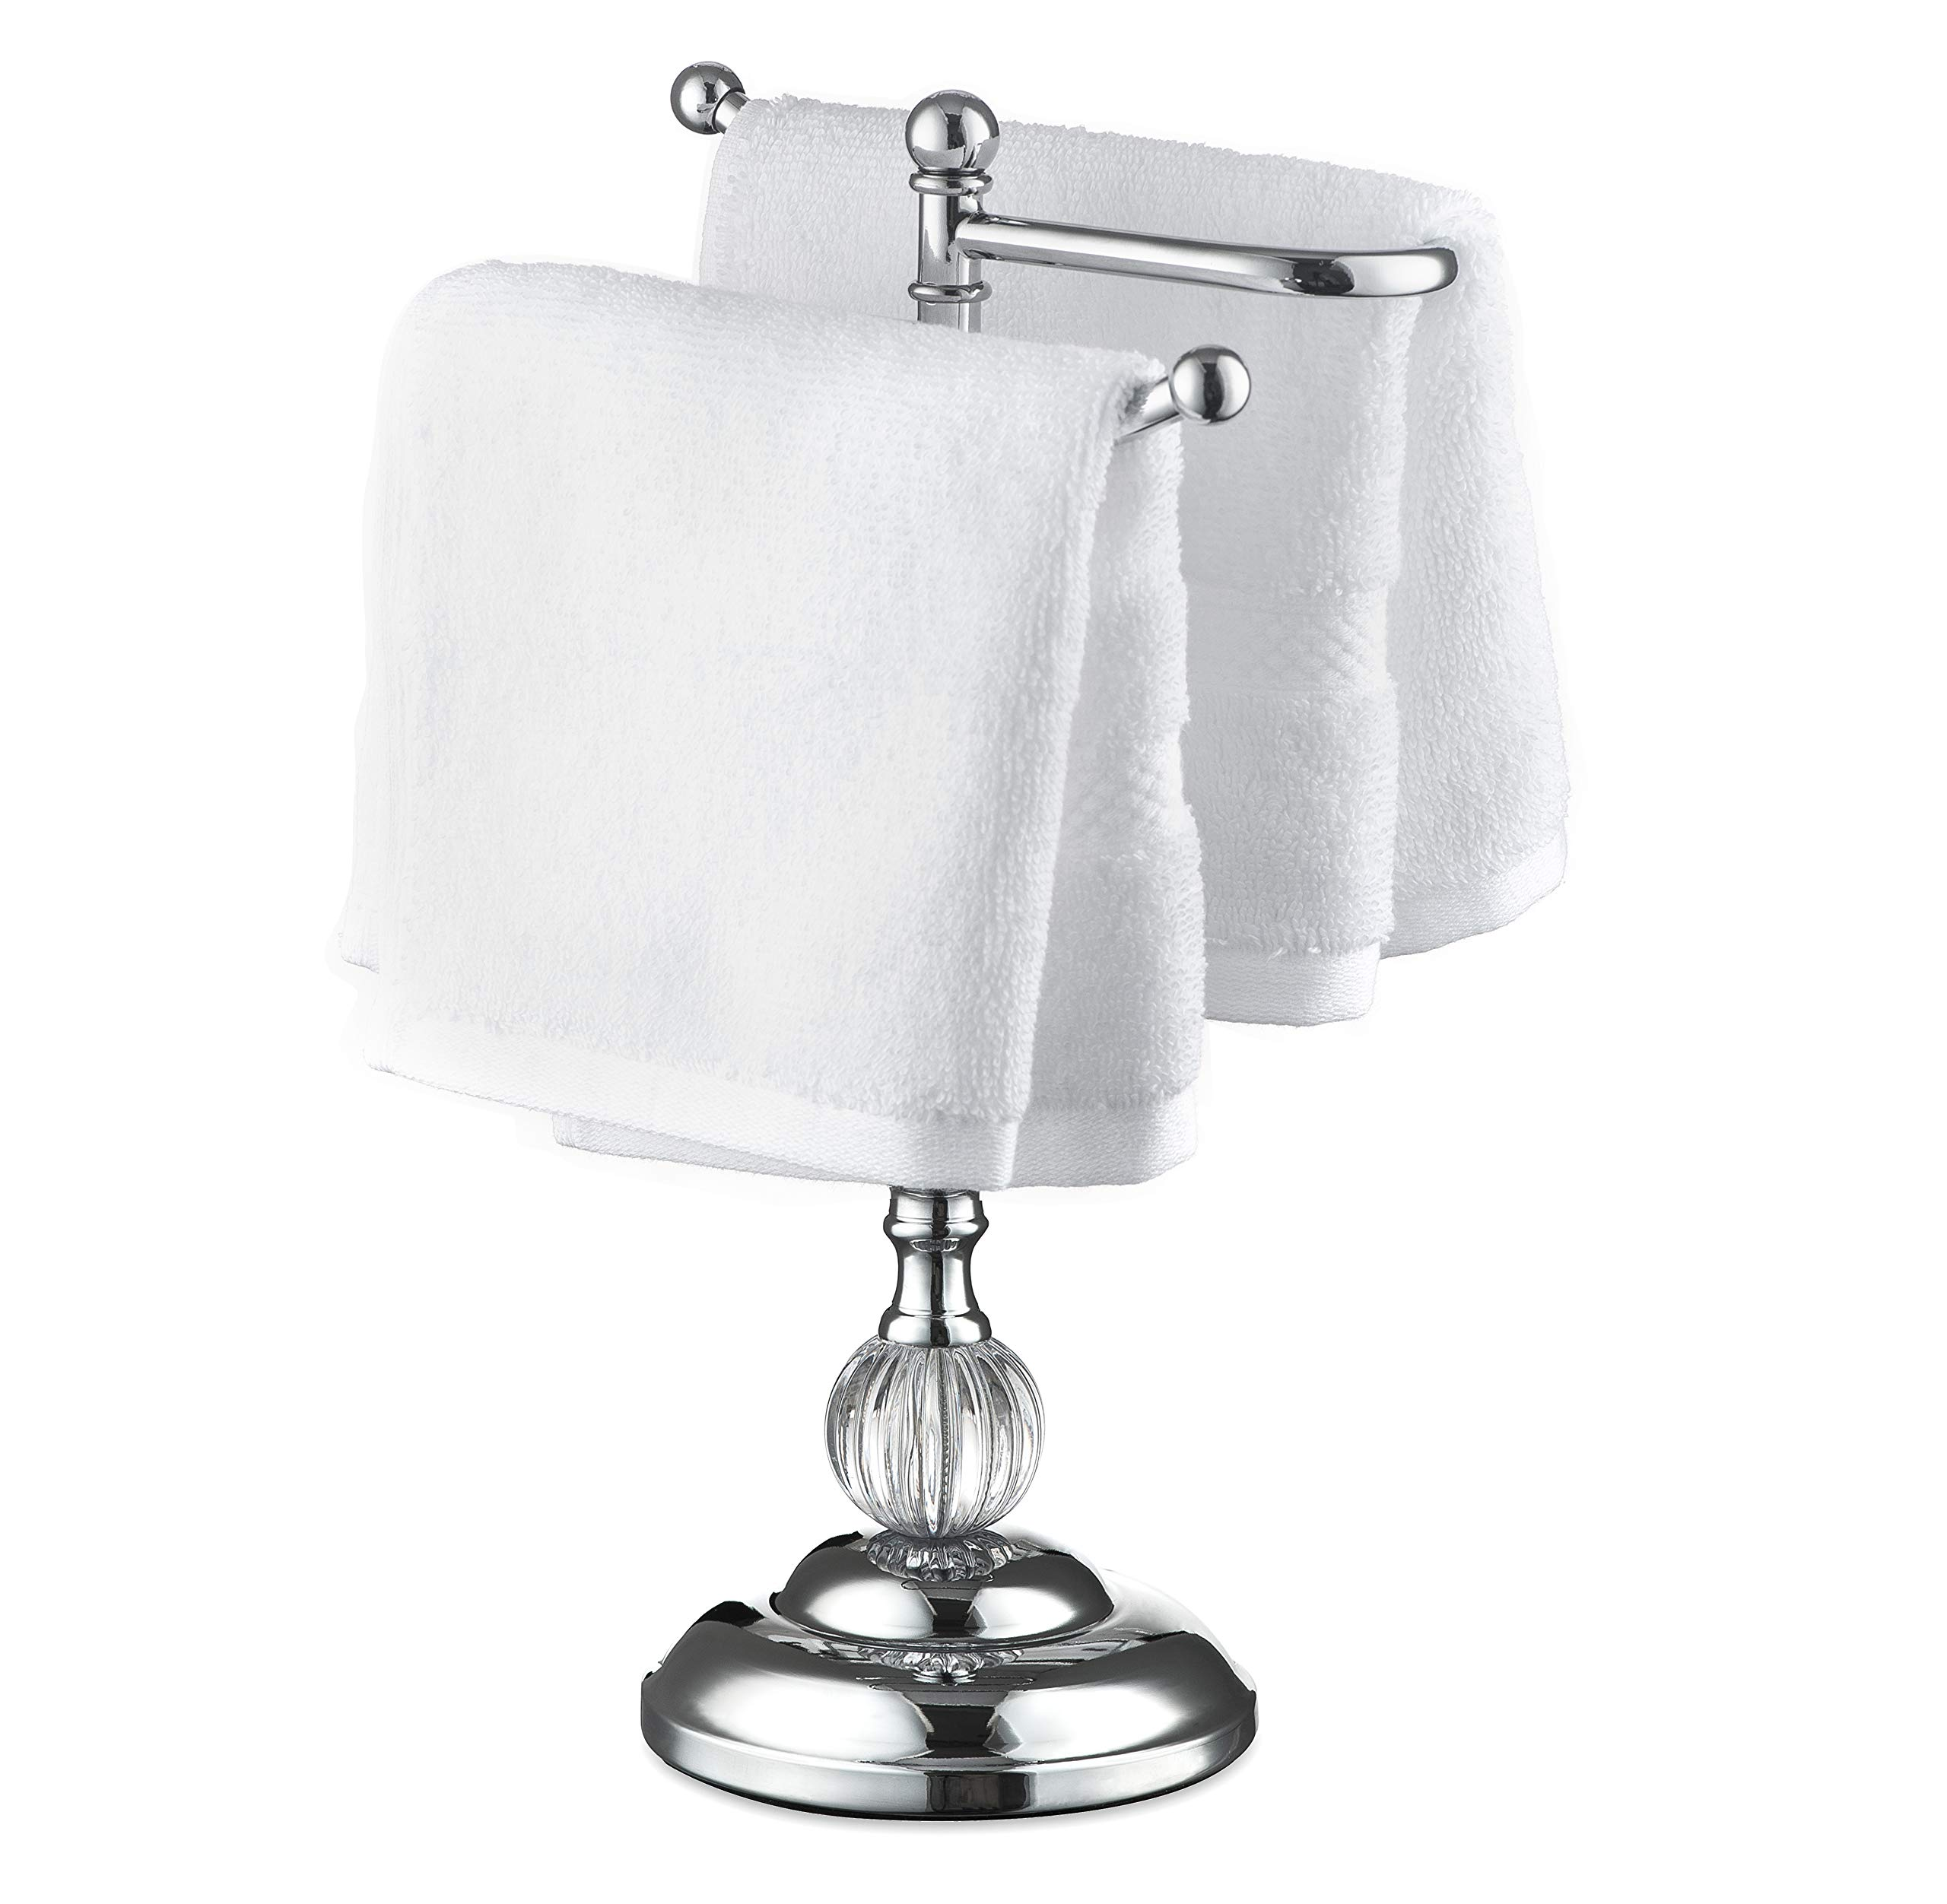 AMG and Enchante Accessories, Free Standing Fingertip Hand Towel Bar Holder Tree Rack, TT110A CHR, Chrome